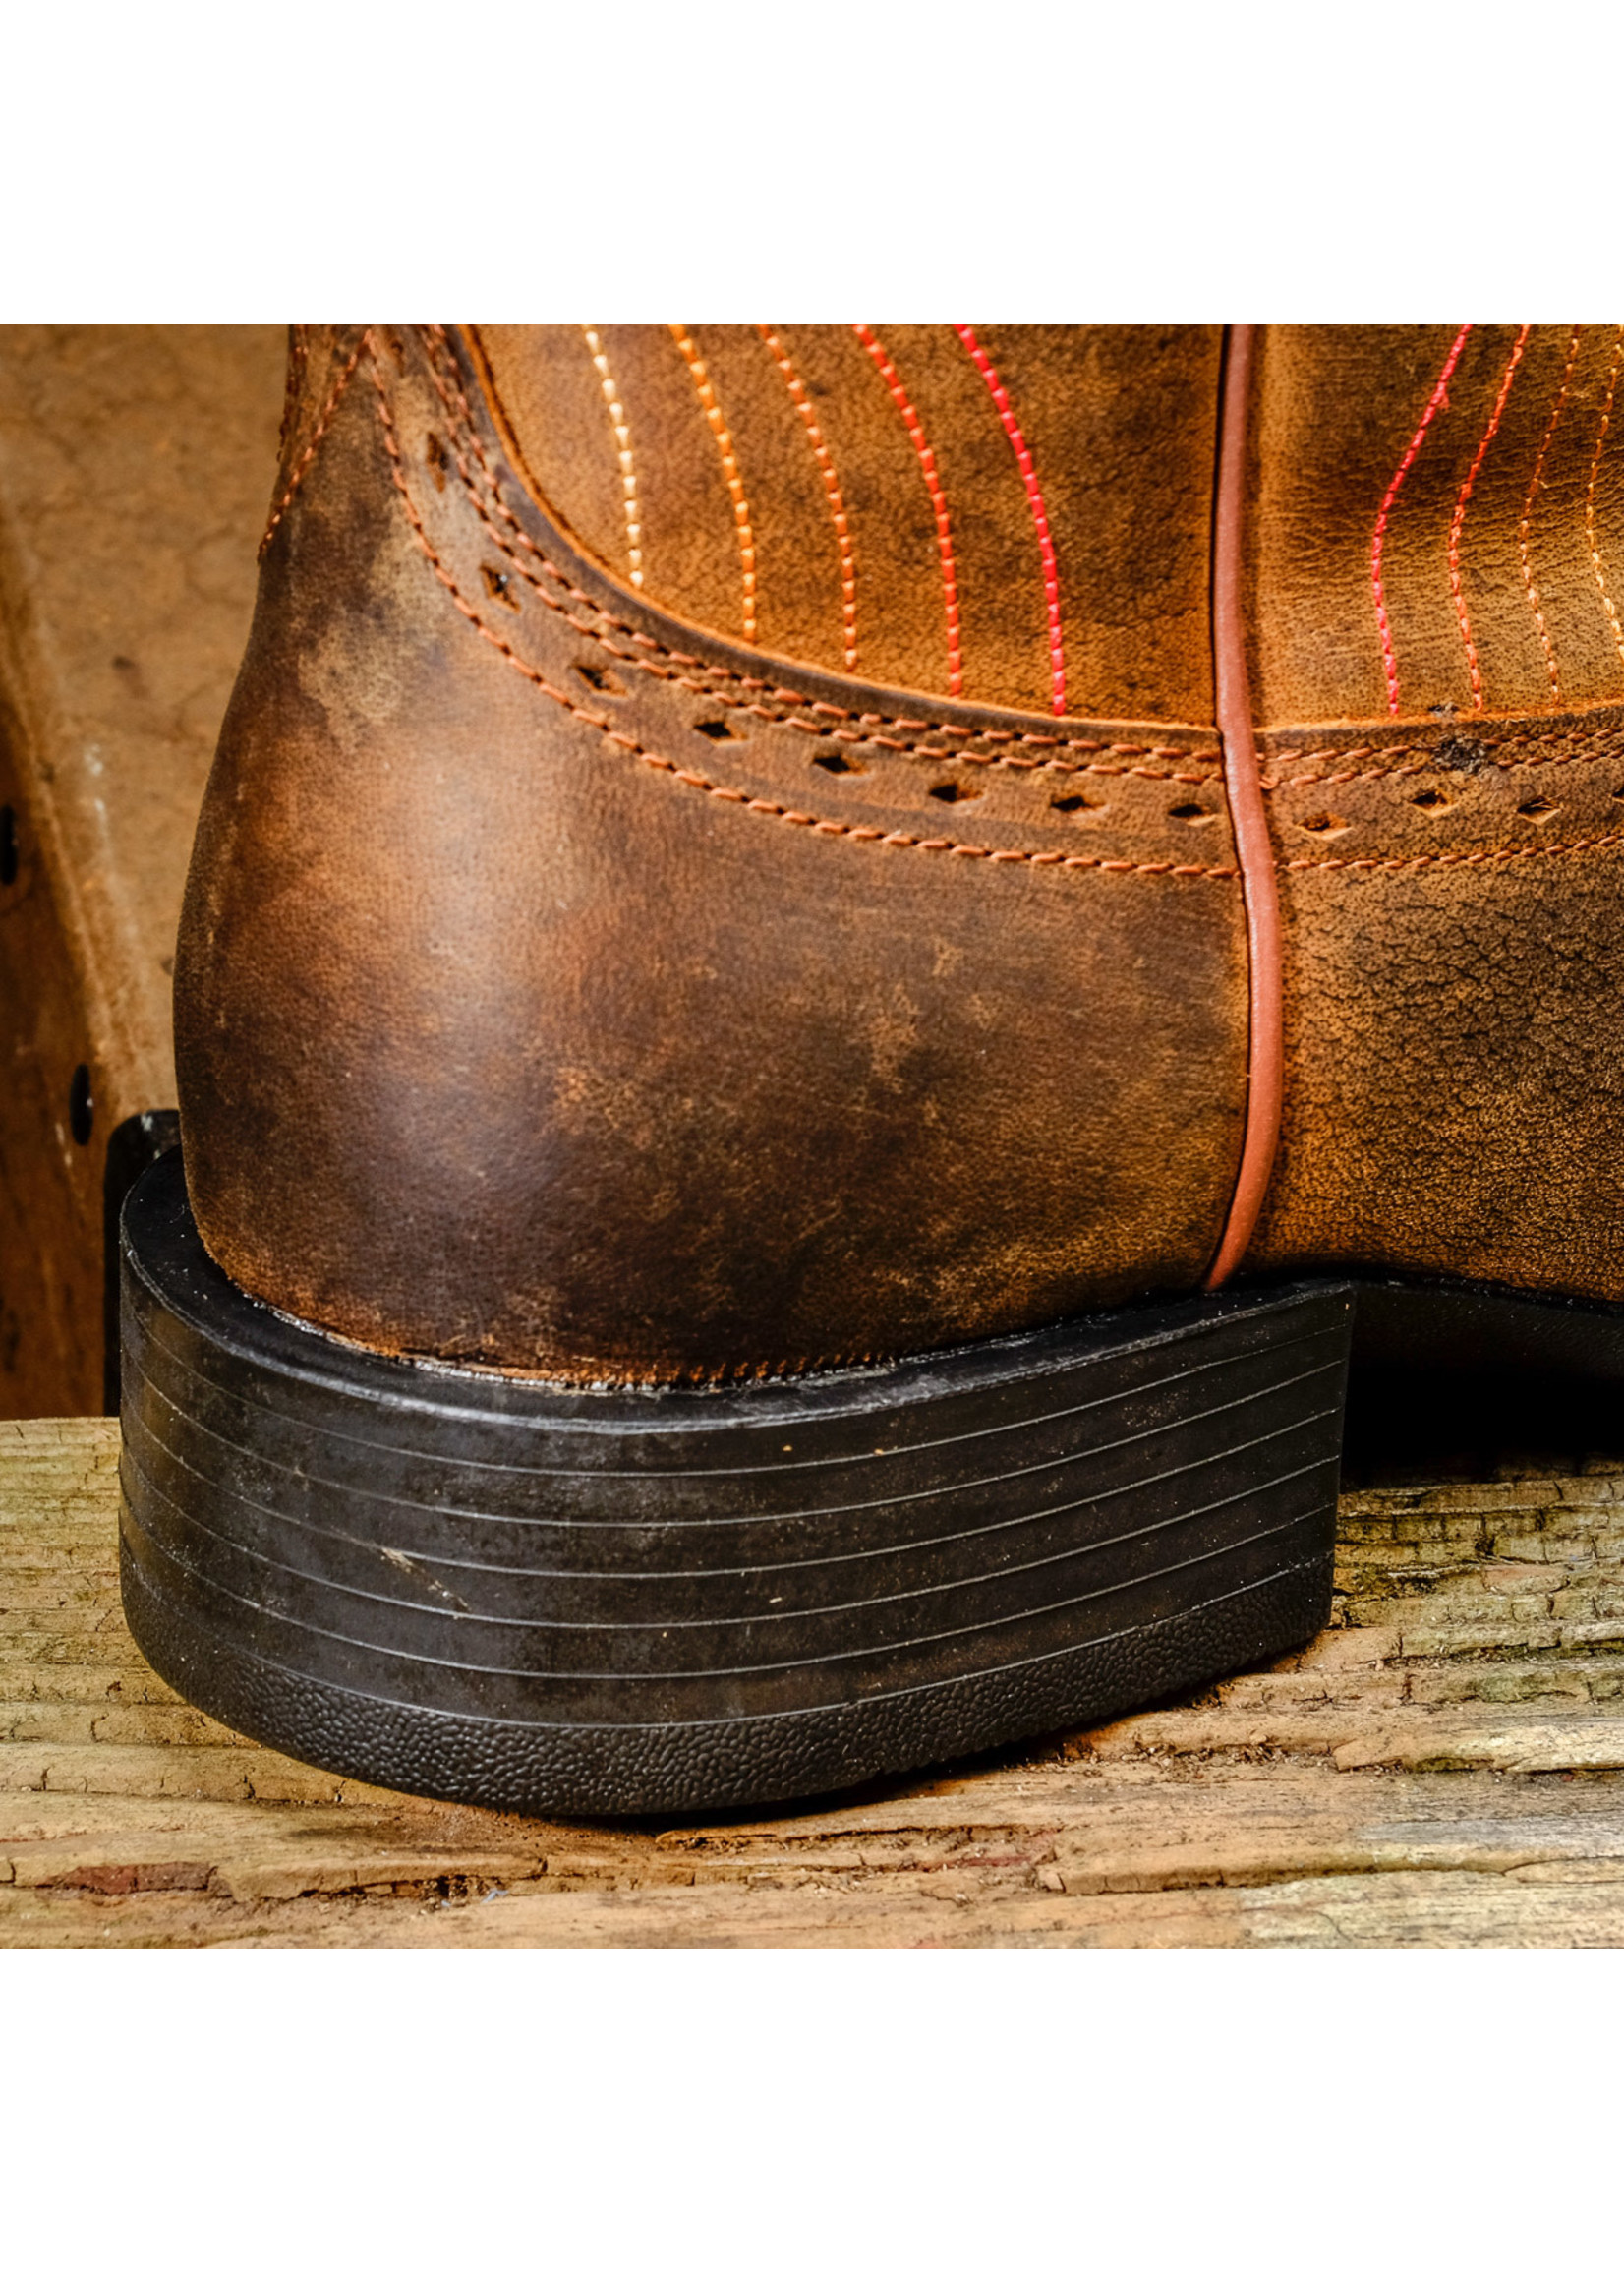 Ariat Men's Sport Wide Square Toe Boots 10010963